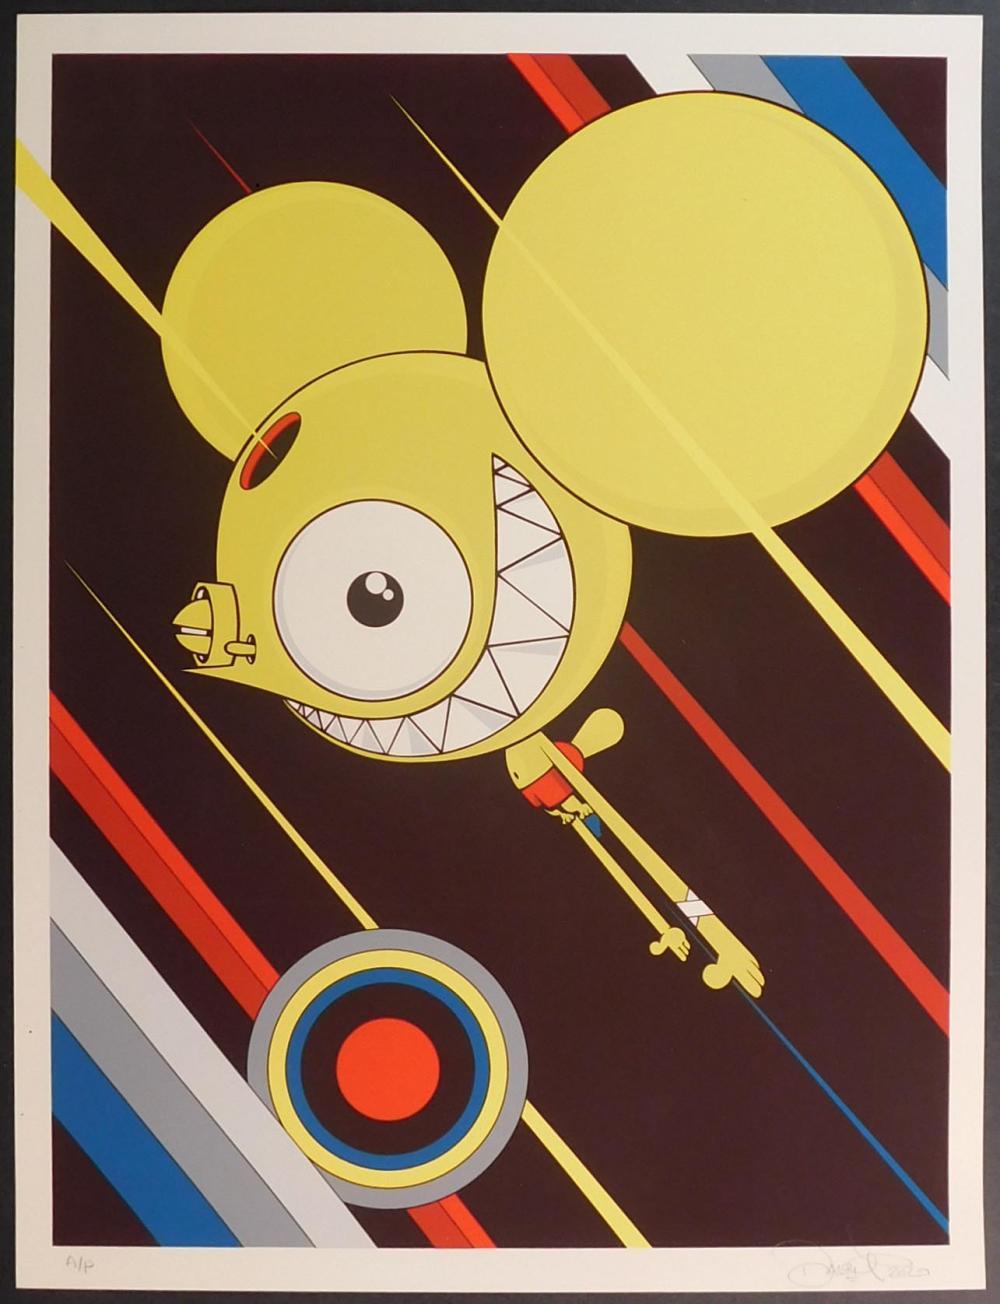 Dalek: Spacemonkey (Flying High)